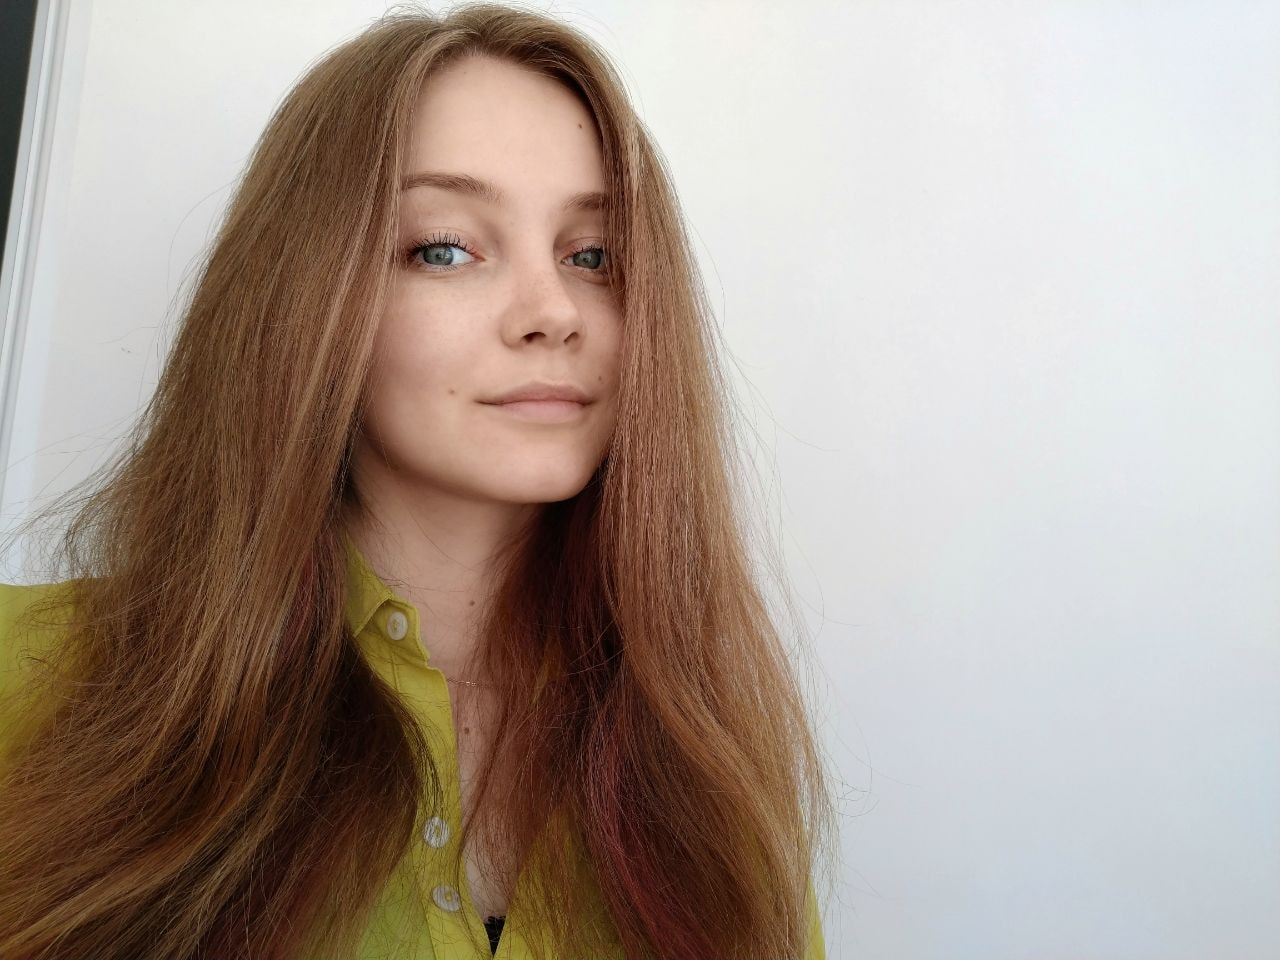 Go to Katerina Pavlyuchkova's profile